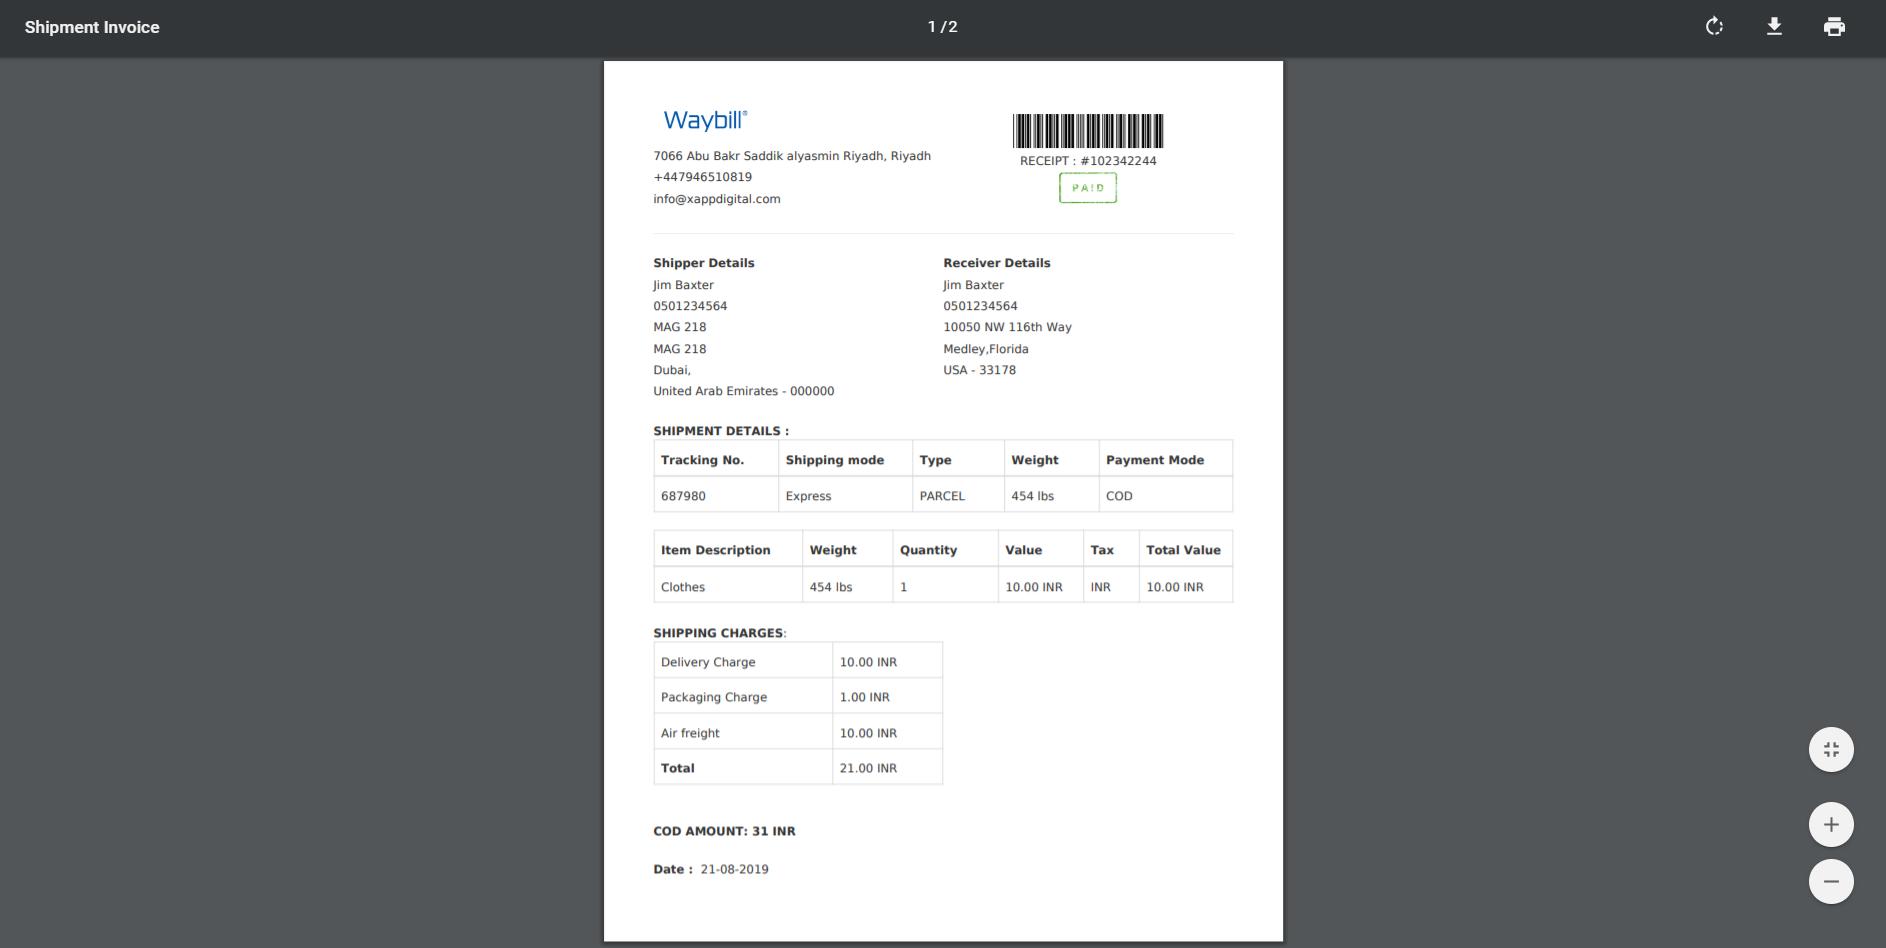 Shipment Invoice